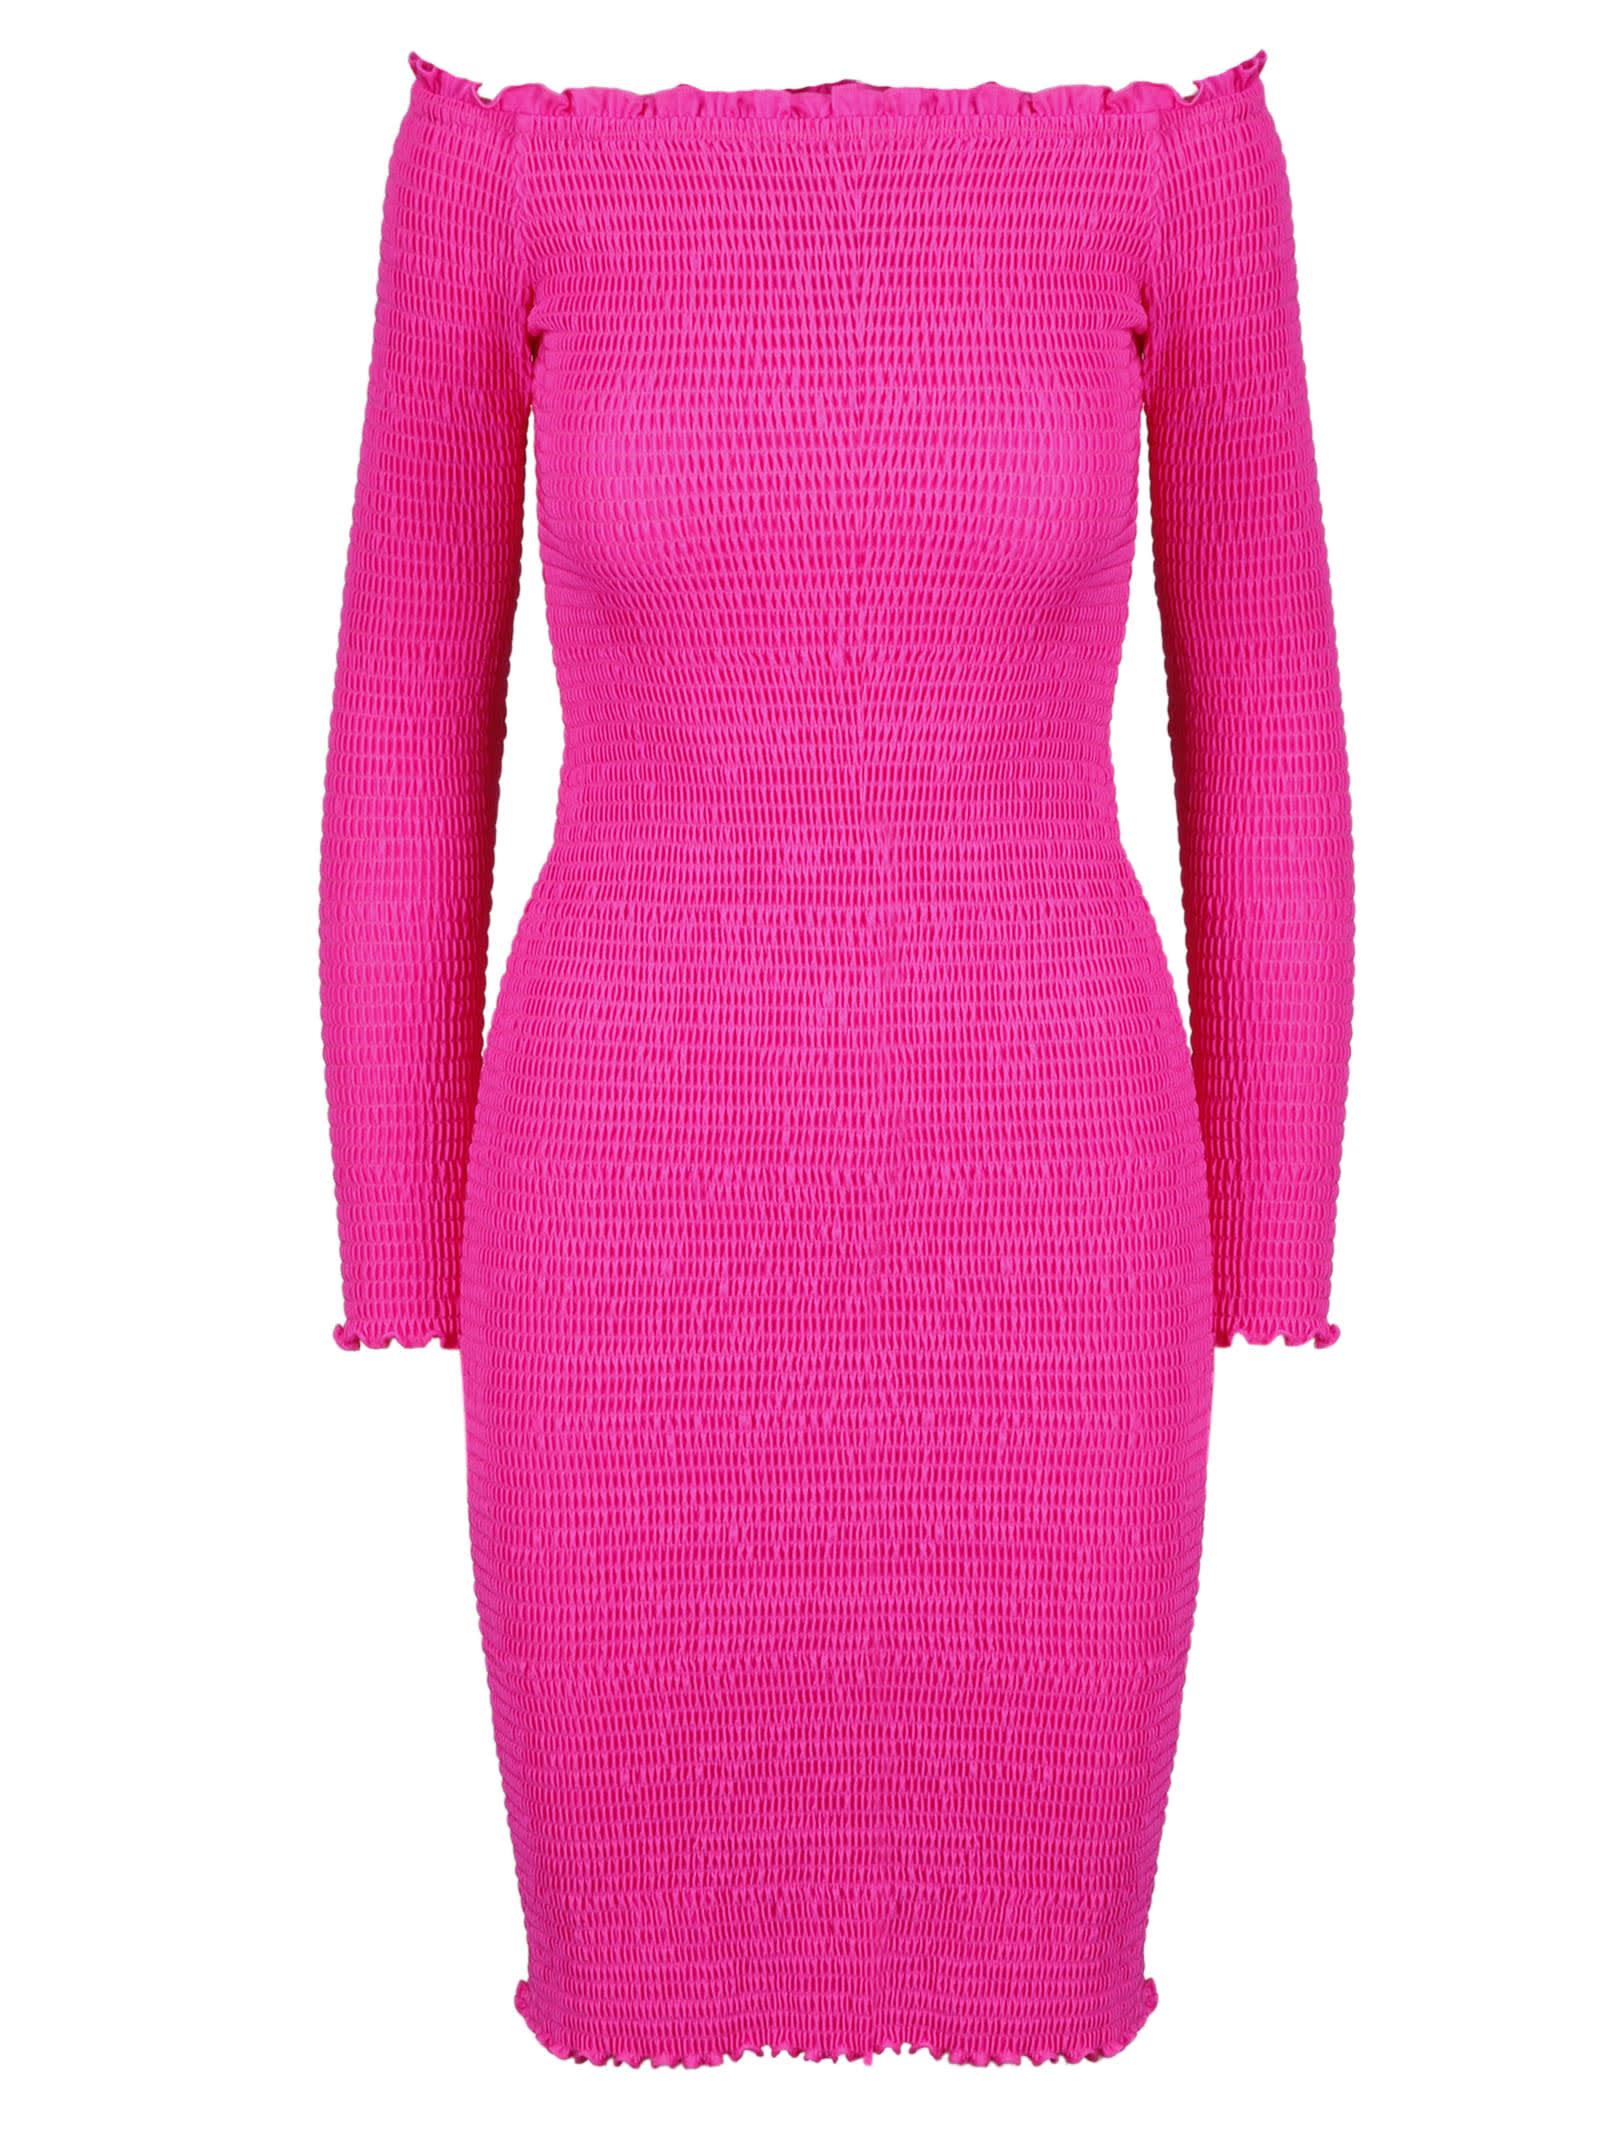 Buy Balenciaga Smocked Mini Dress online, shop Balenciaga with free shipping